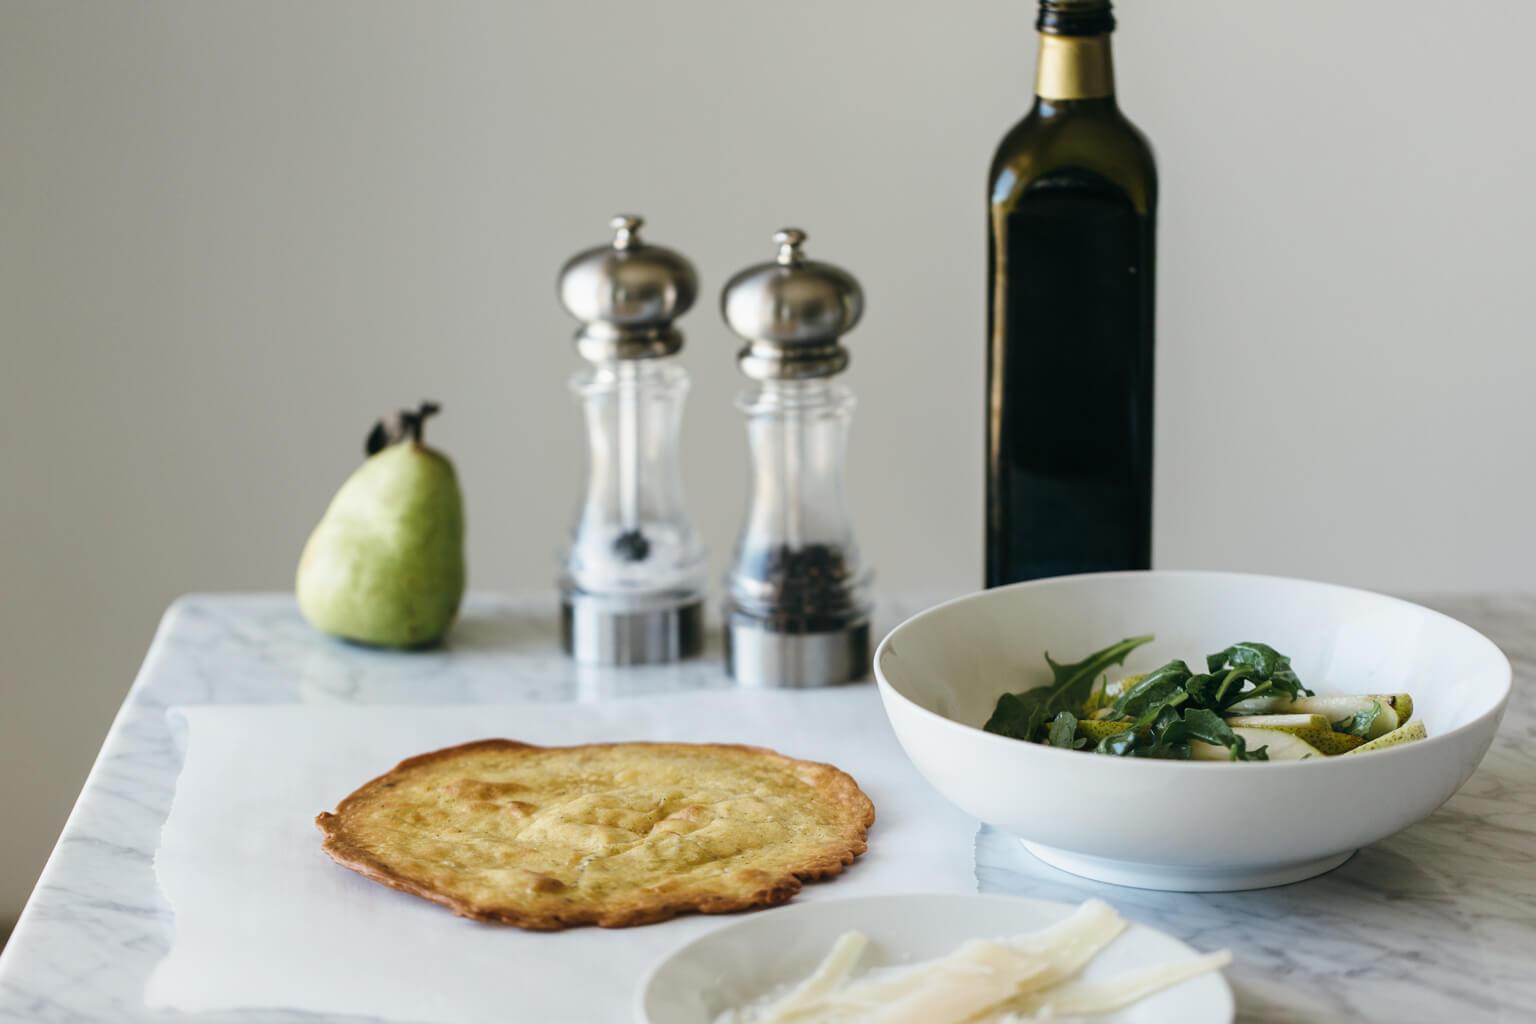 Crispy socca with pear and arugula salad. Gluten-free, grain-free, paleo.